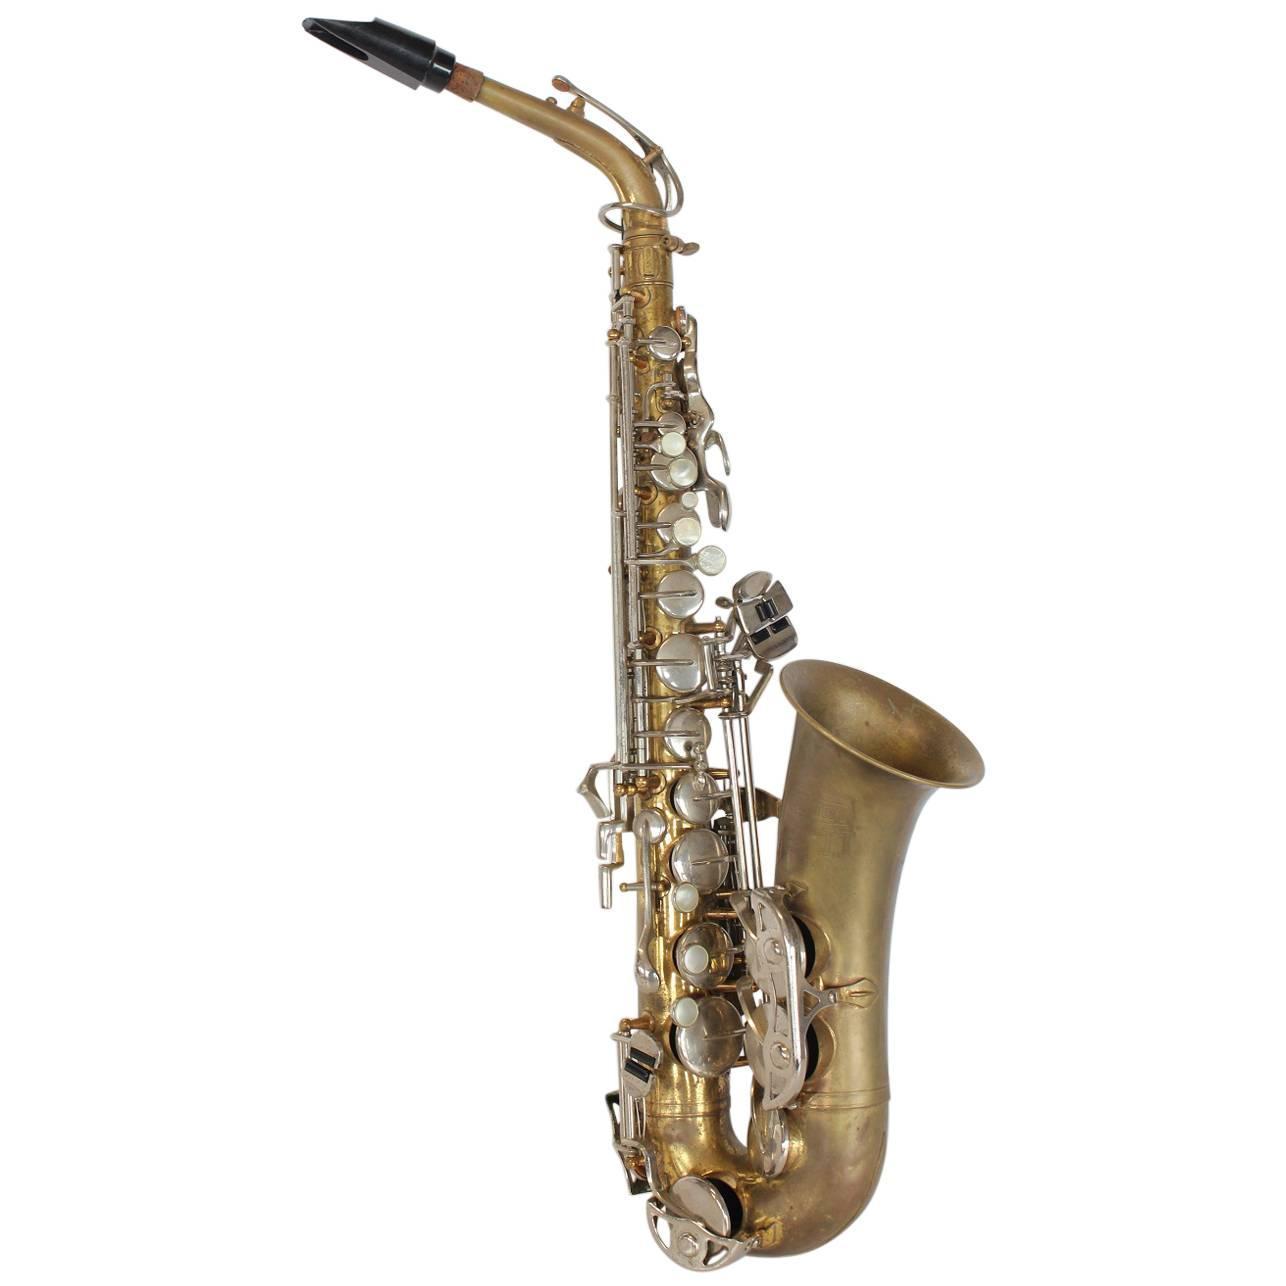 Vintage Selmer Saxophone 102